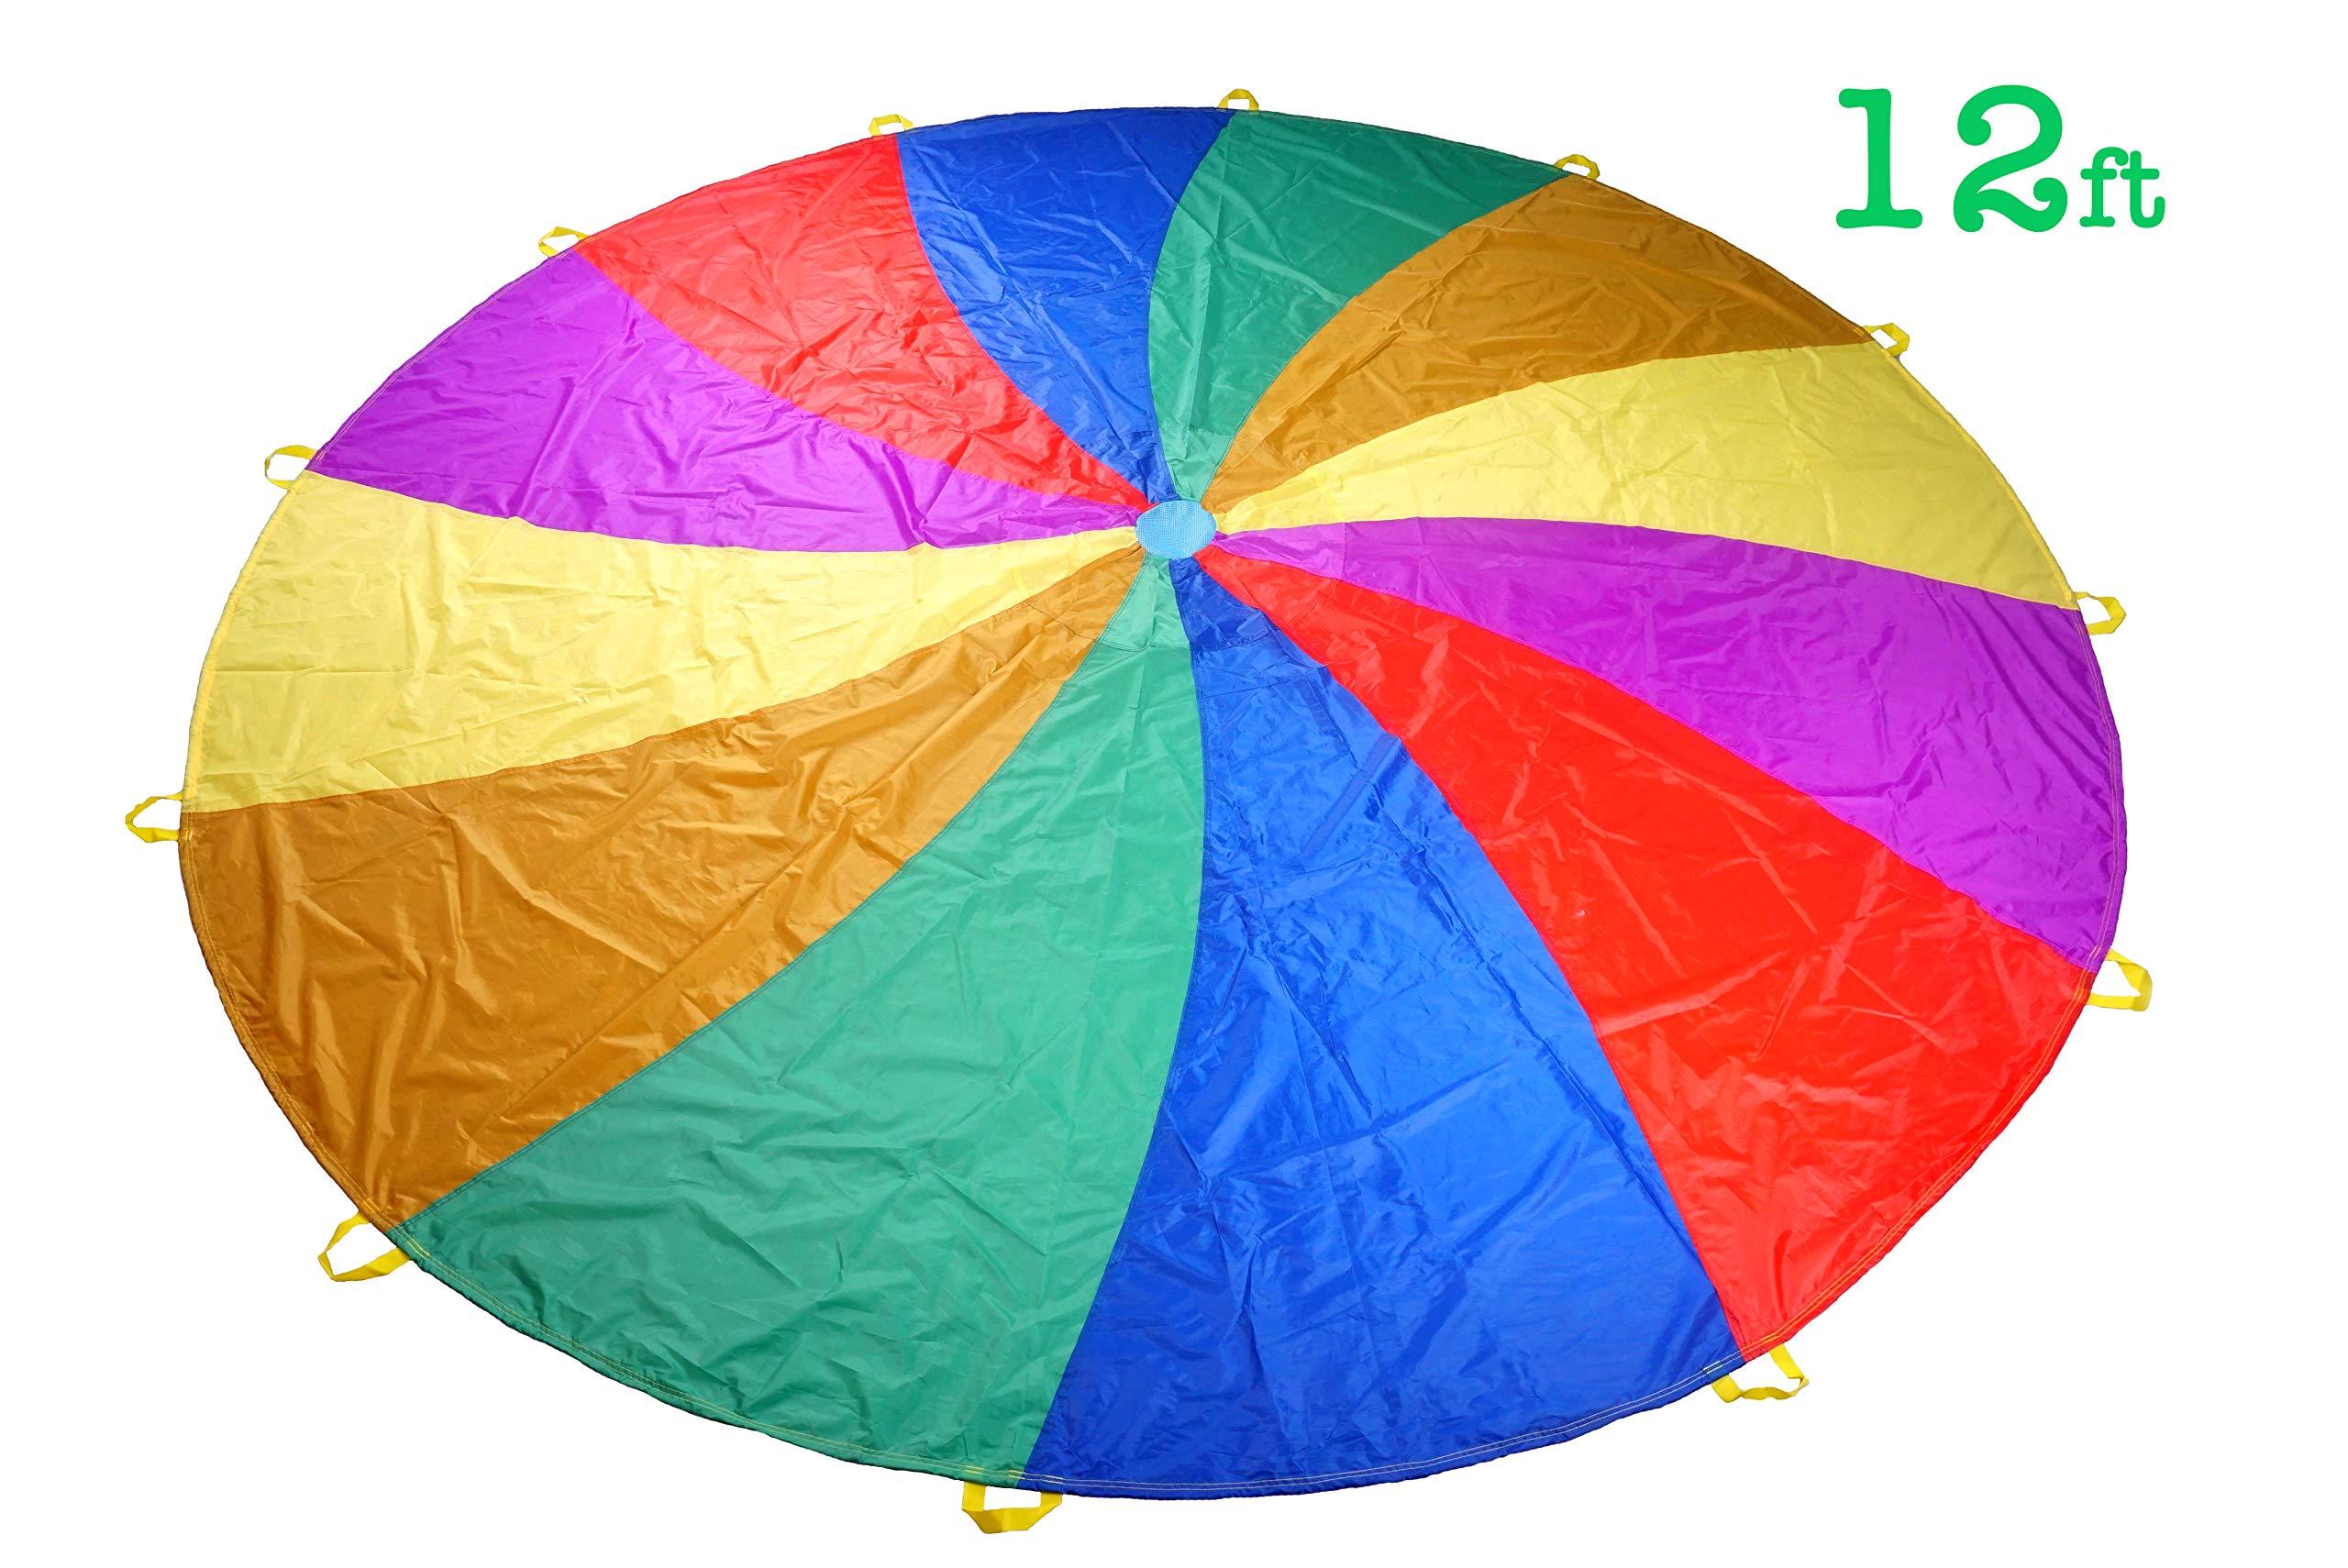 NARMAY Play Parachute for Kids Rotating Rainbow with 12 Handles - 12 Feet by NARMAY